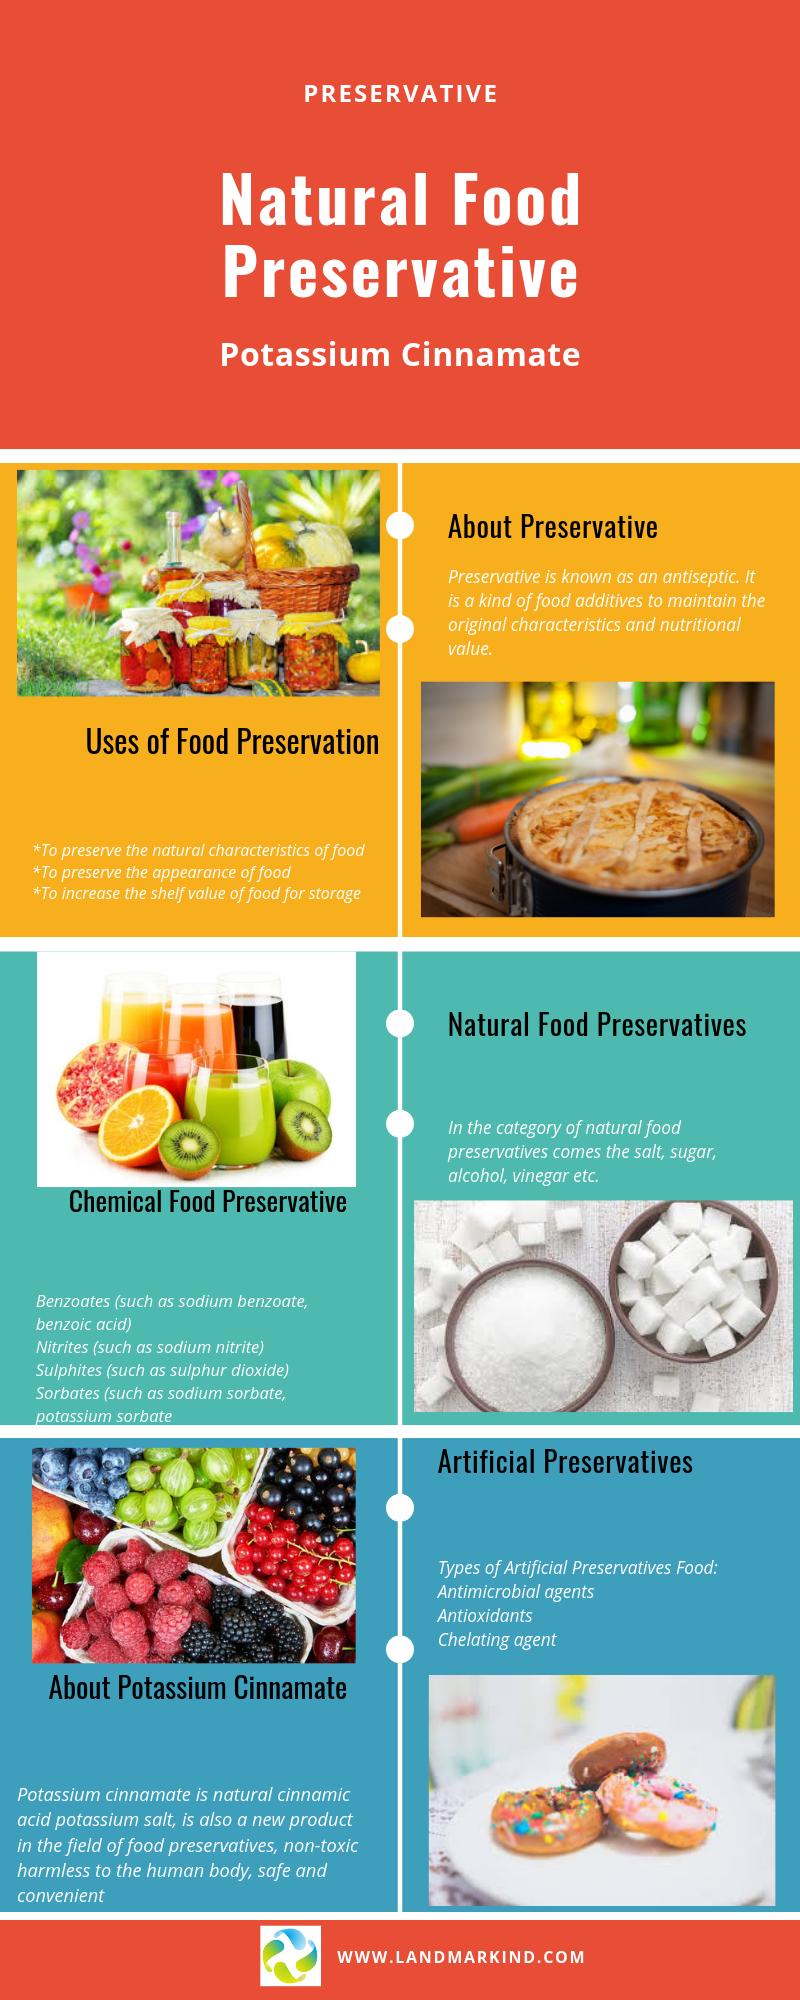 Potassium Cinnamate - Natural Food Preservative - 1